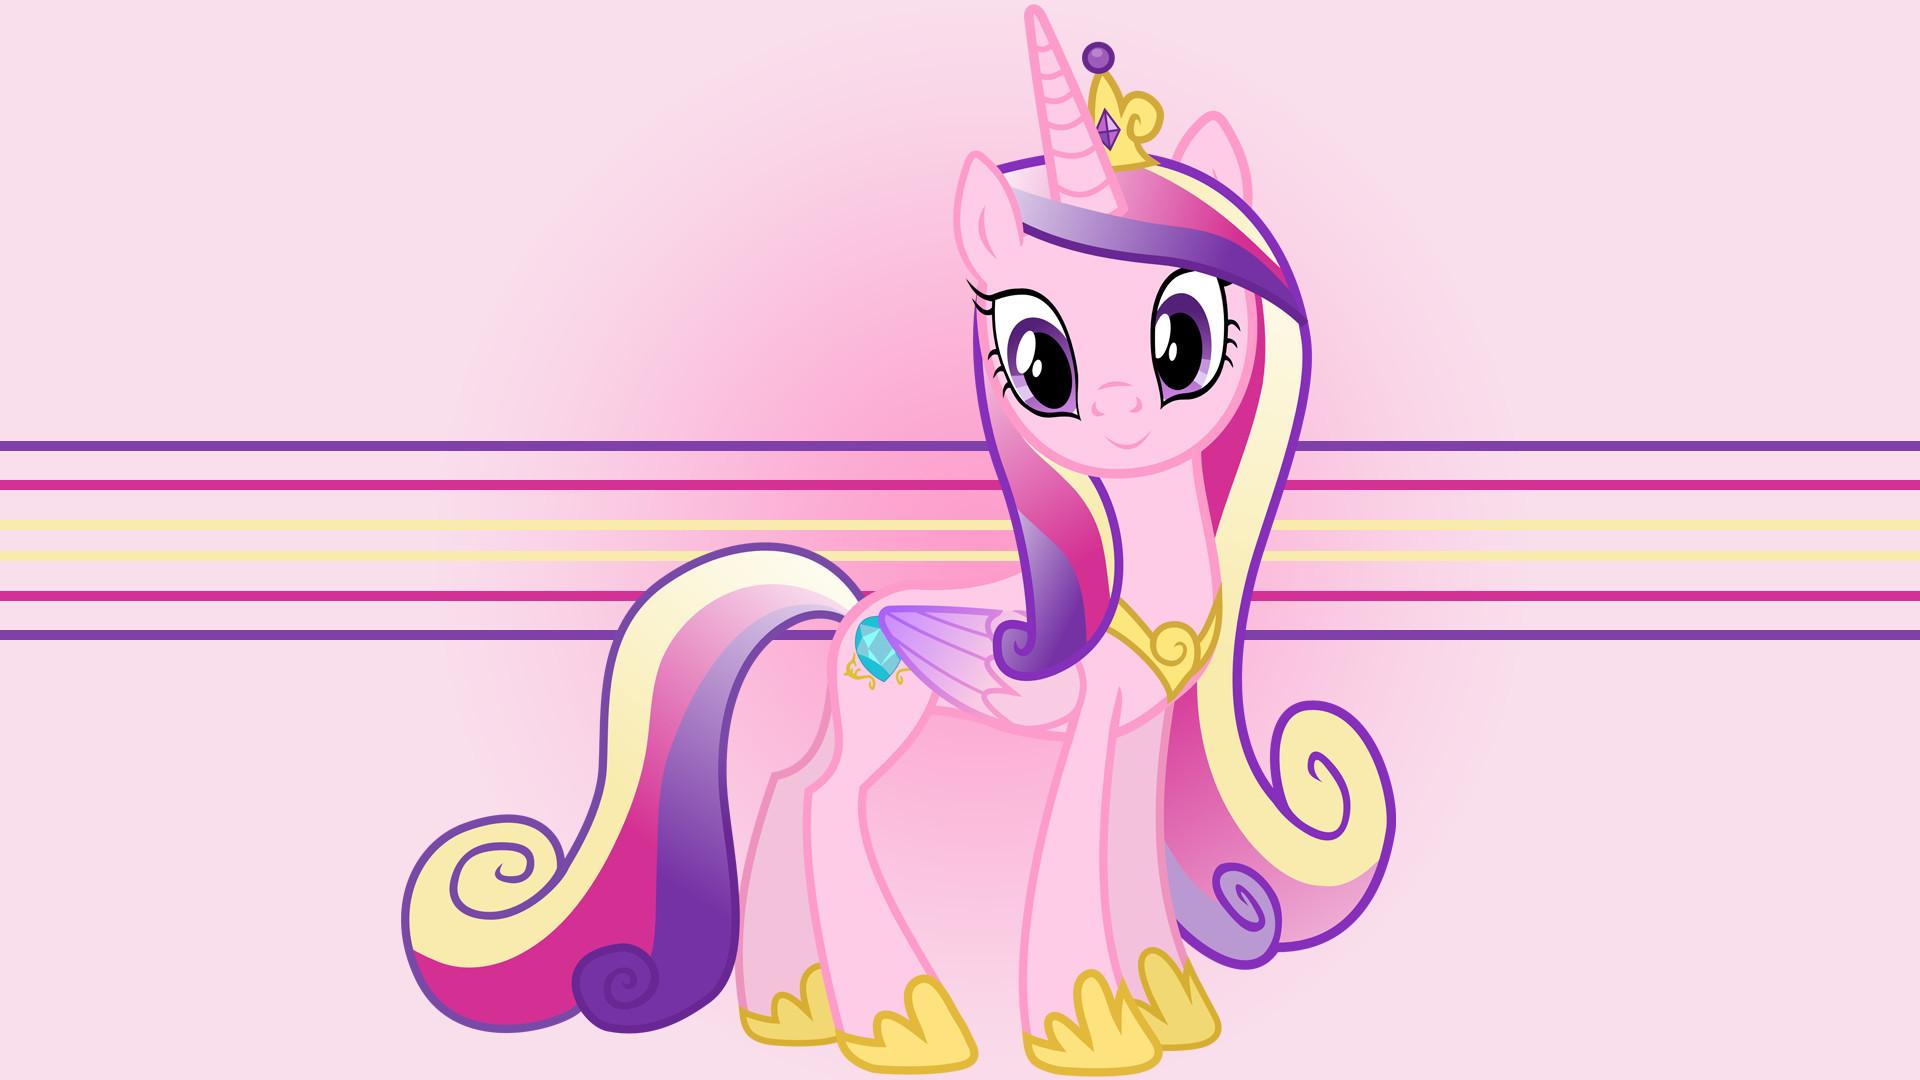 mlp princess cadence wallpaper 87 images